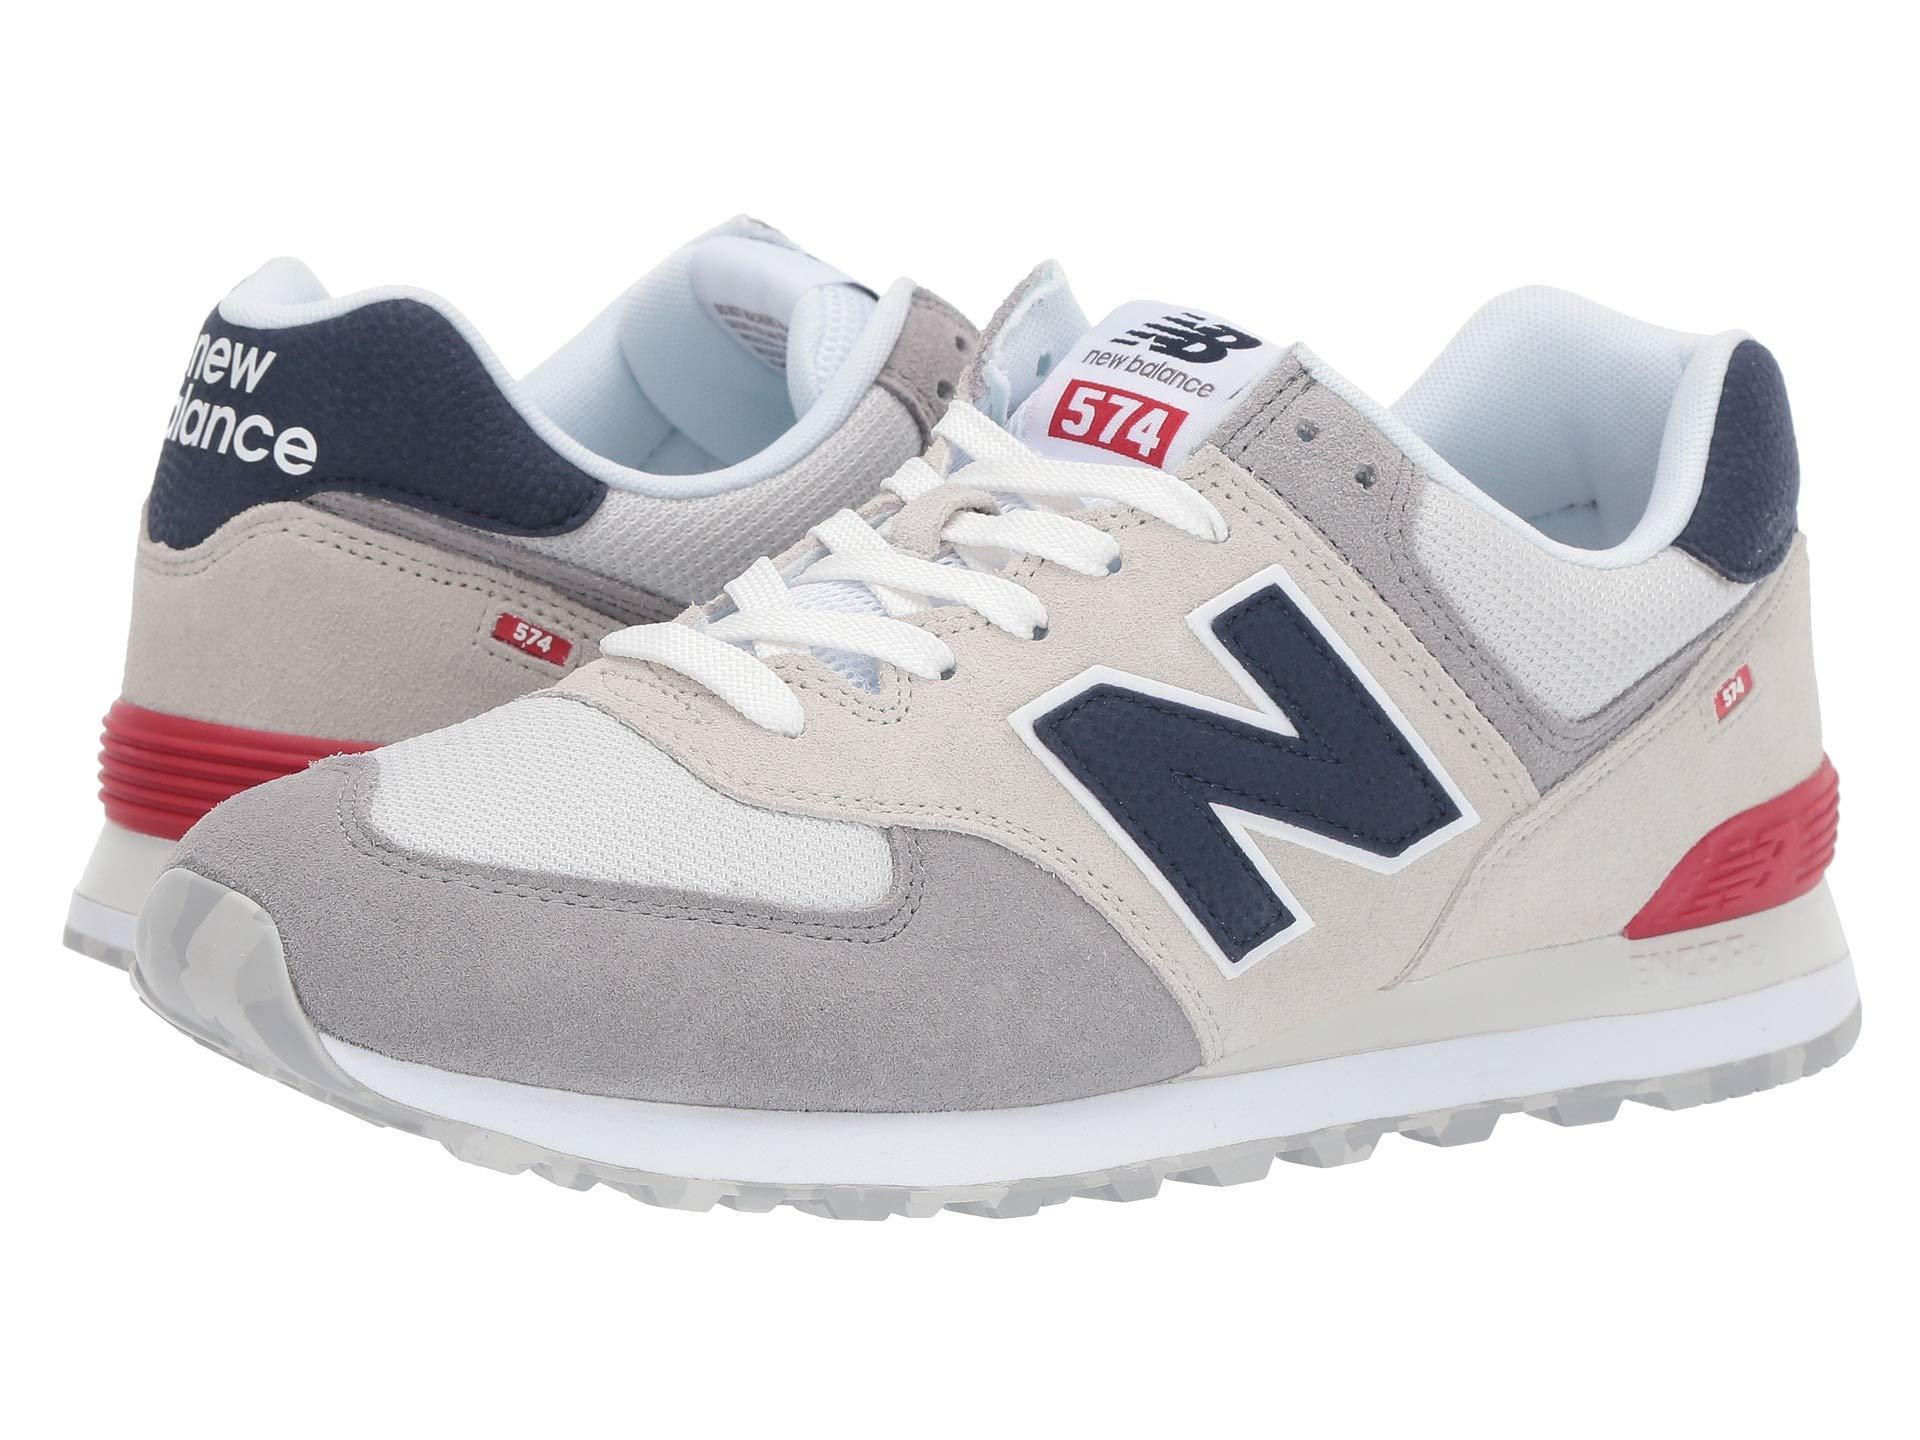 New Balance Suede 574v2-usa (dark Navy/marred Blue) Men's Shoes ...